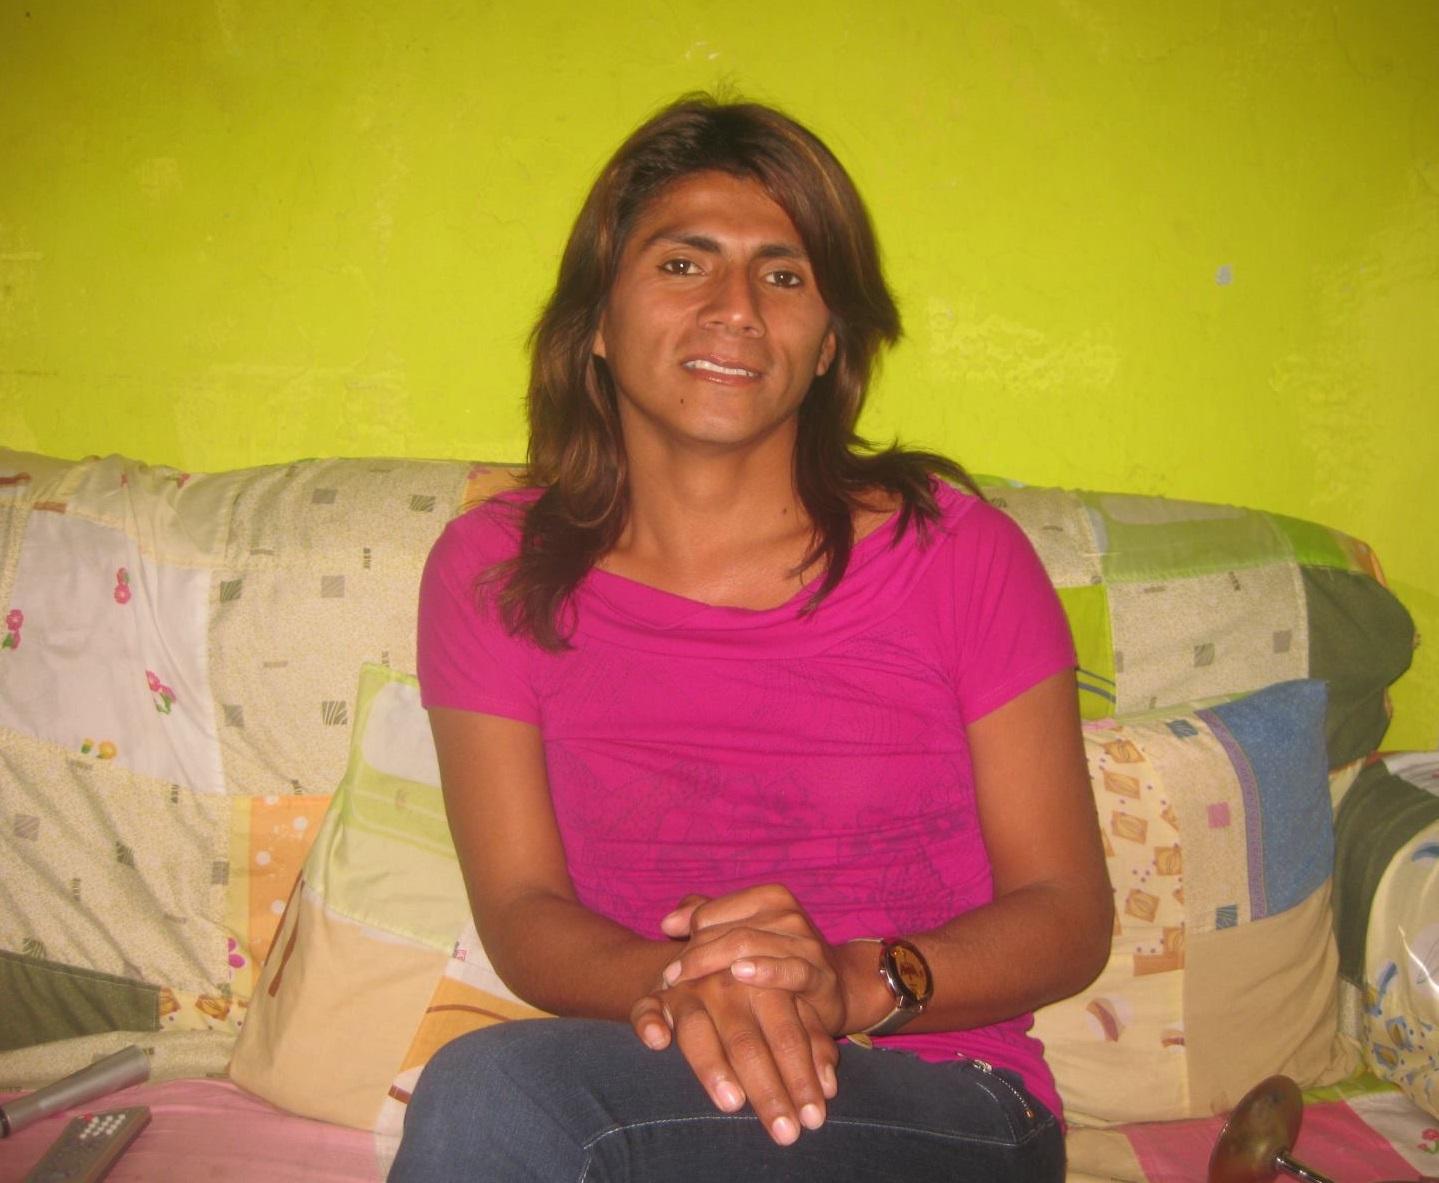 Luis Alberto Rojas_credit himself